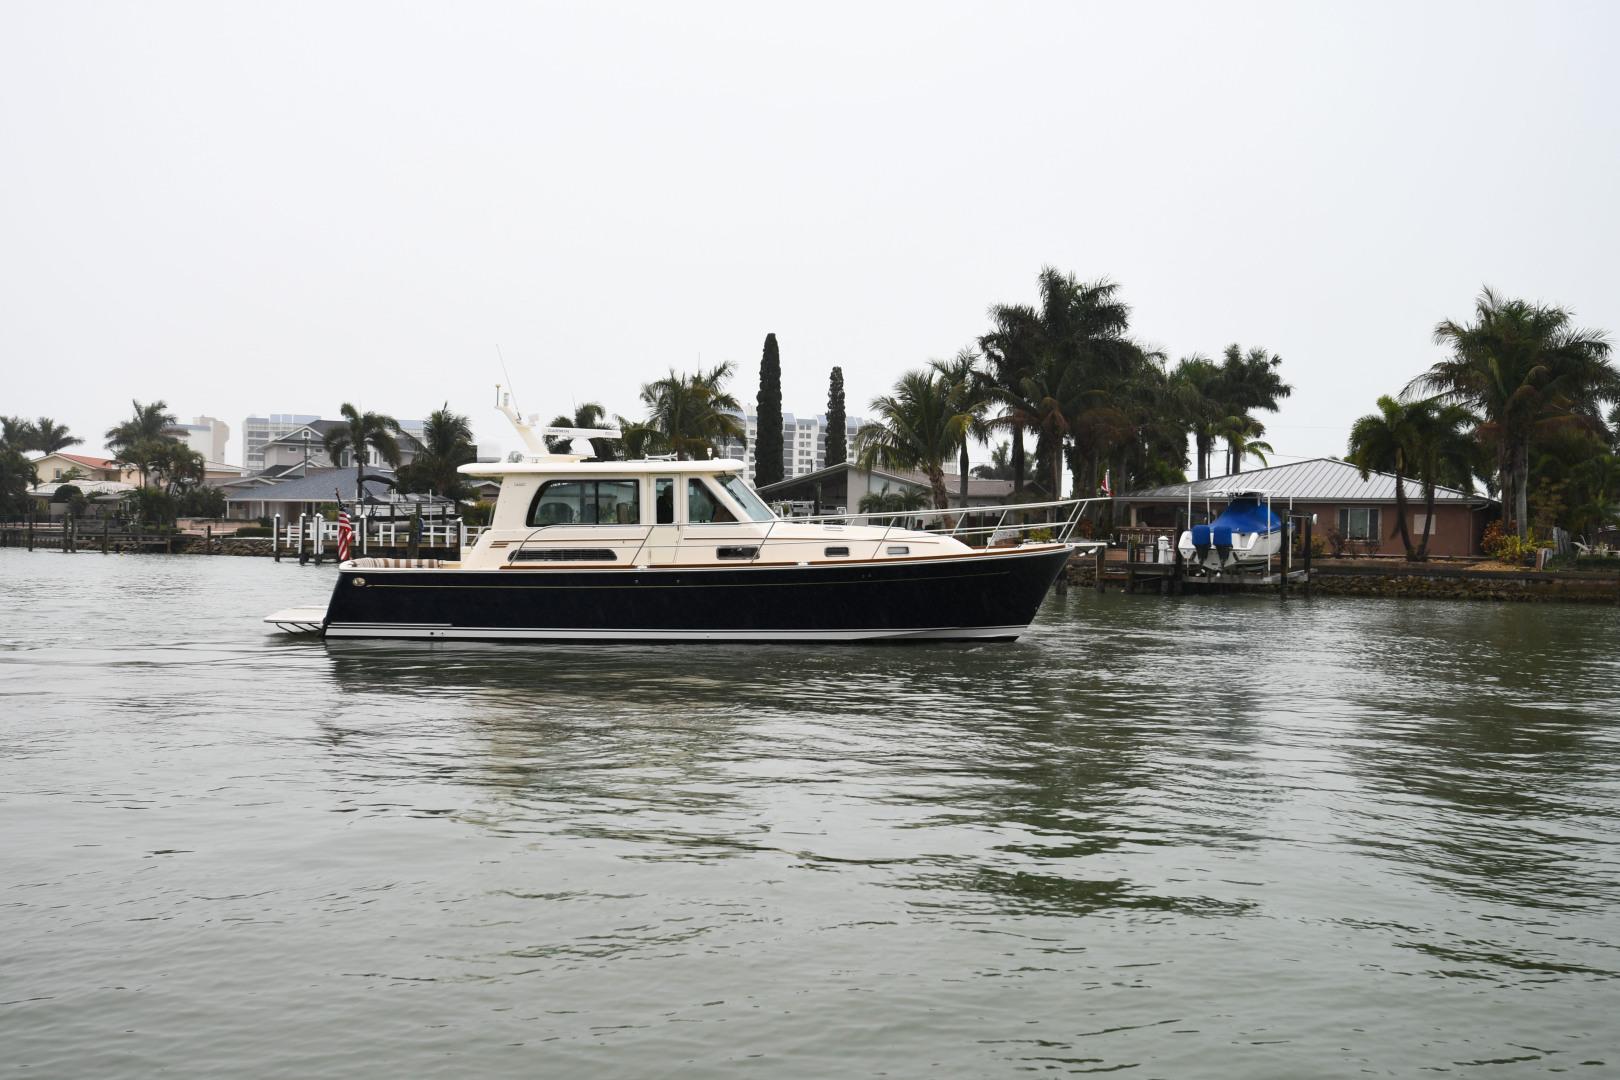 Sabre-40 Express 2010-Impulse Treasure Island-Florida-United States-2010 40 Sabre Express  Impulse  Profile-1618656 | Thumbnail